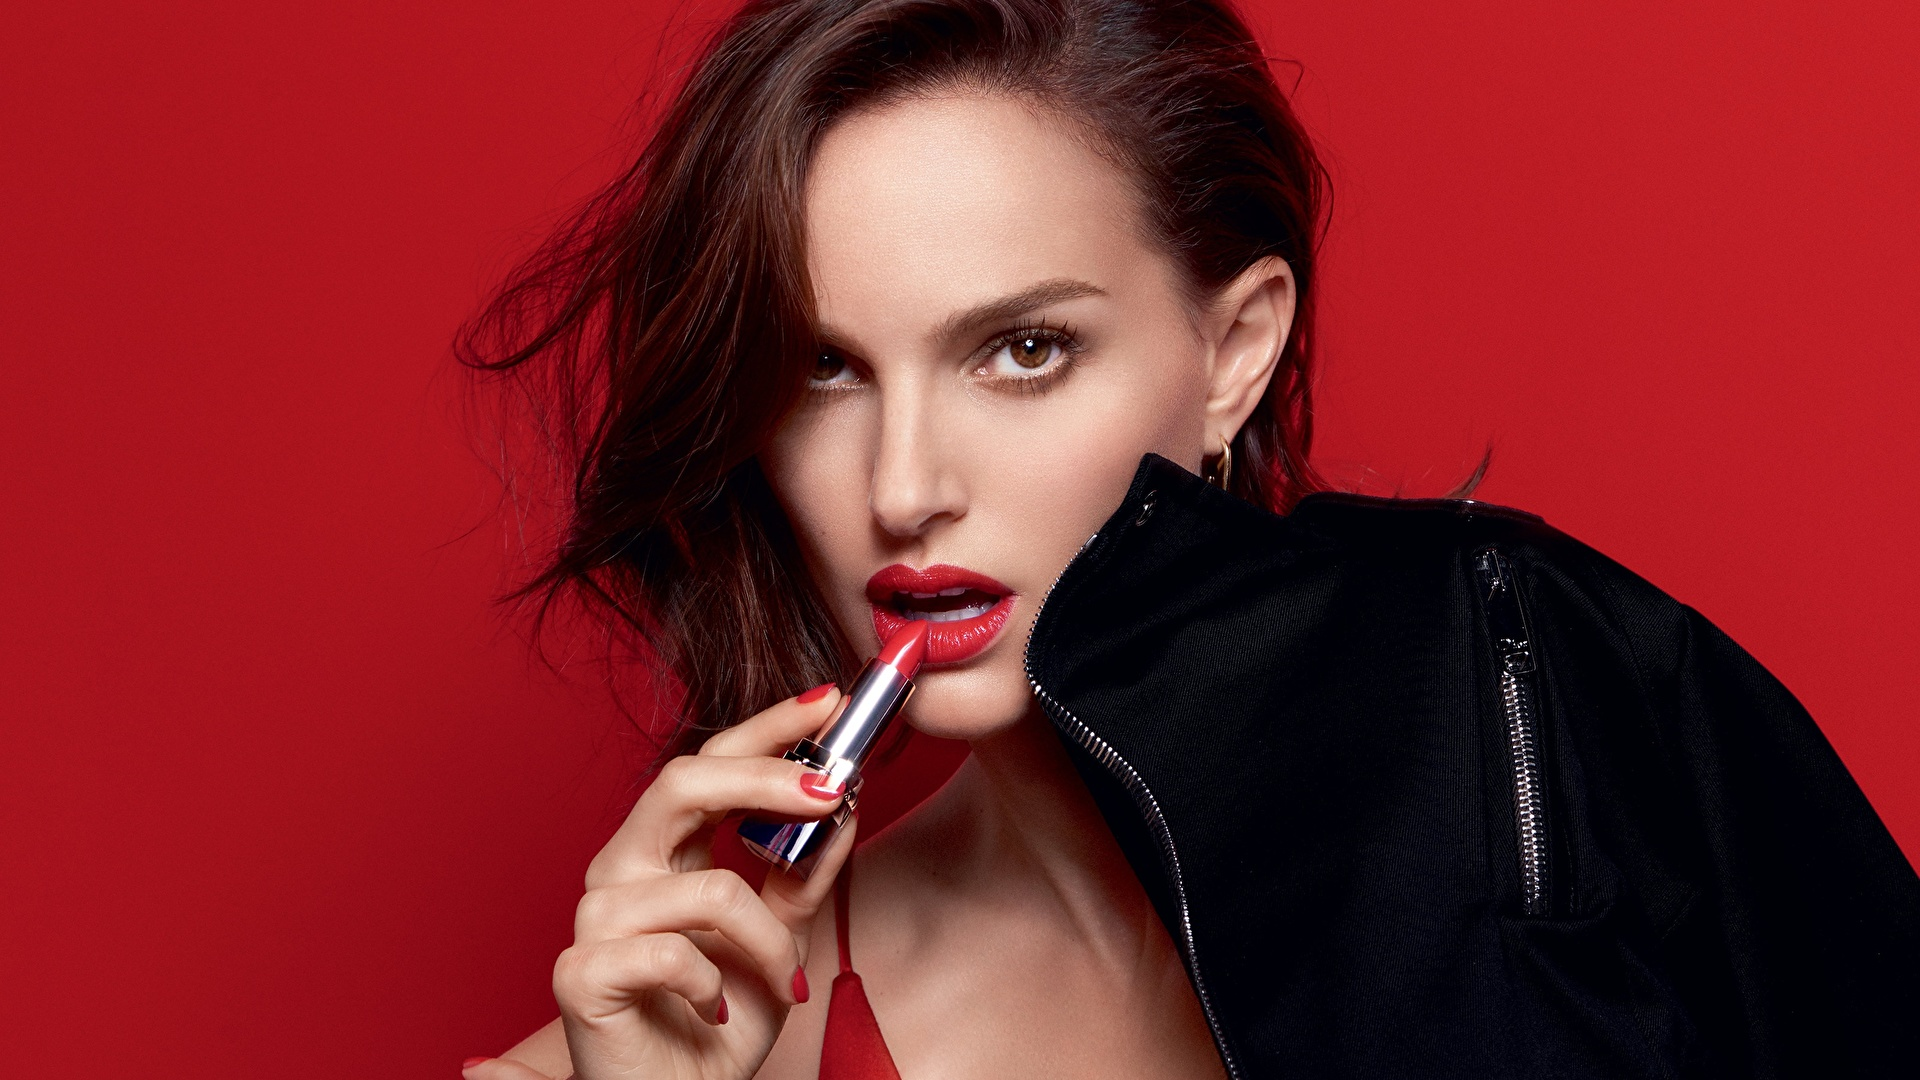 Wallpaper Natalie Portman Model Rouge Dior young woman 1920x1080 1920x1080